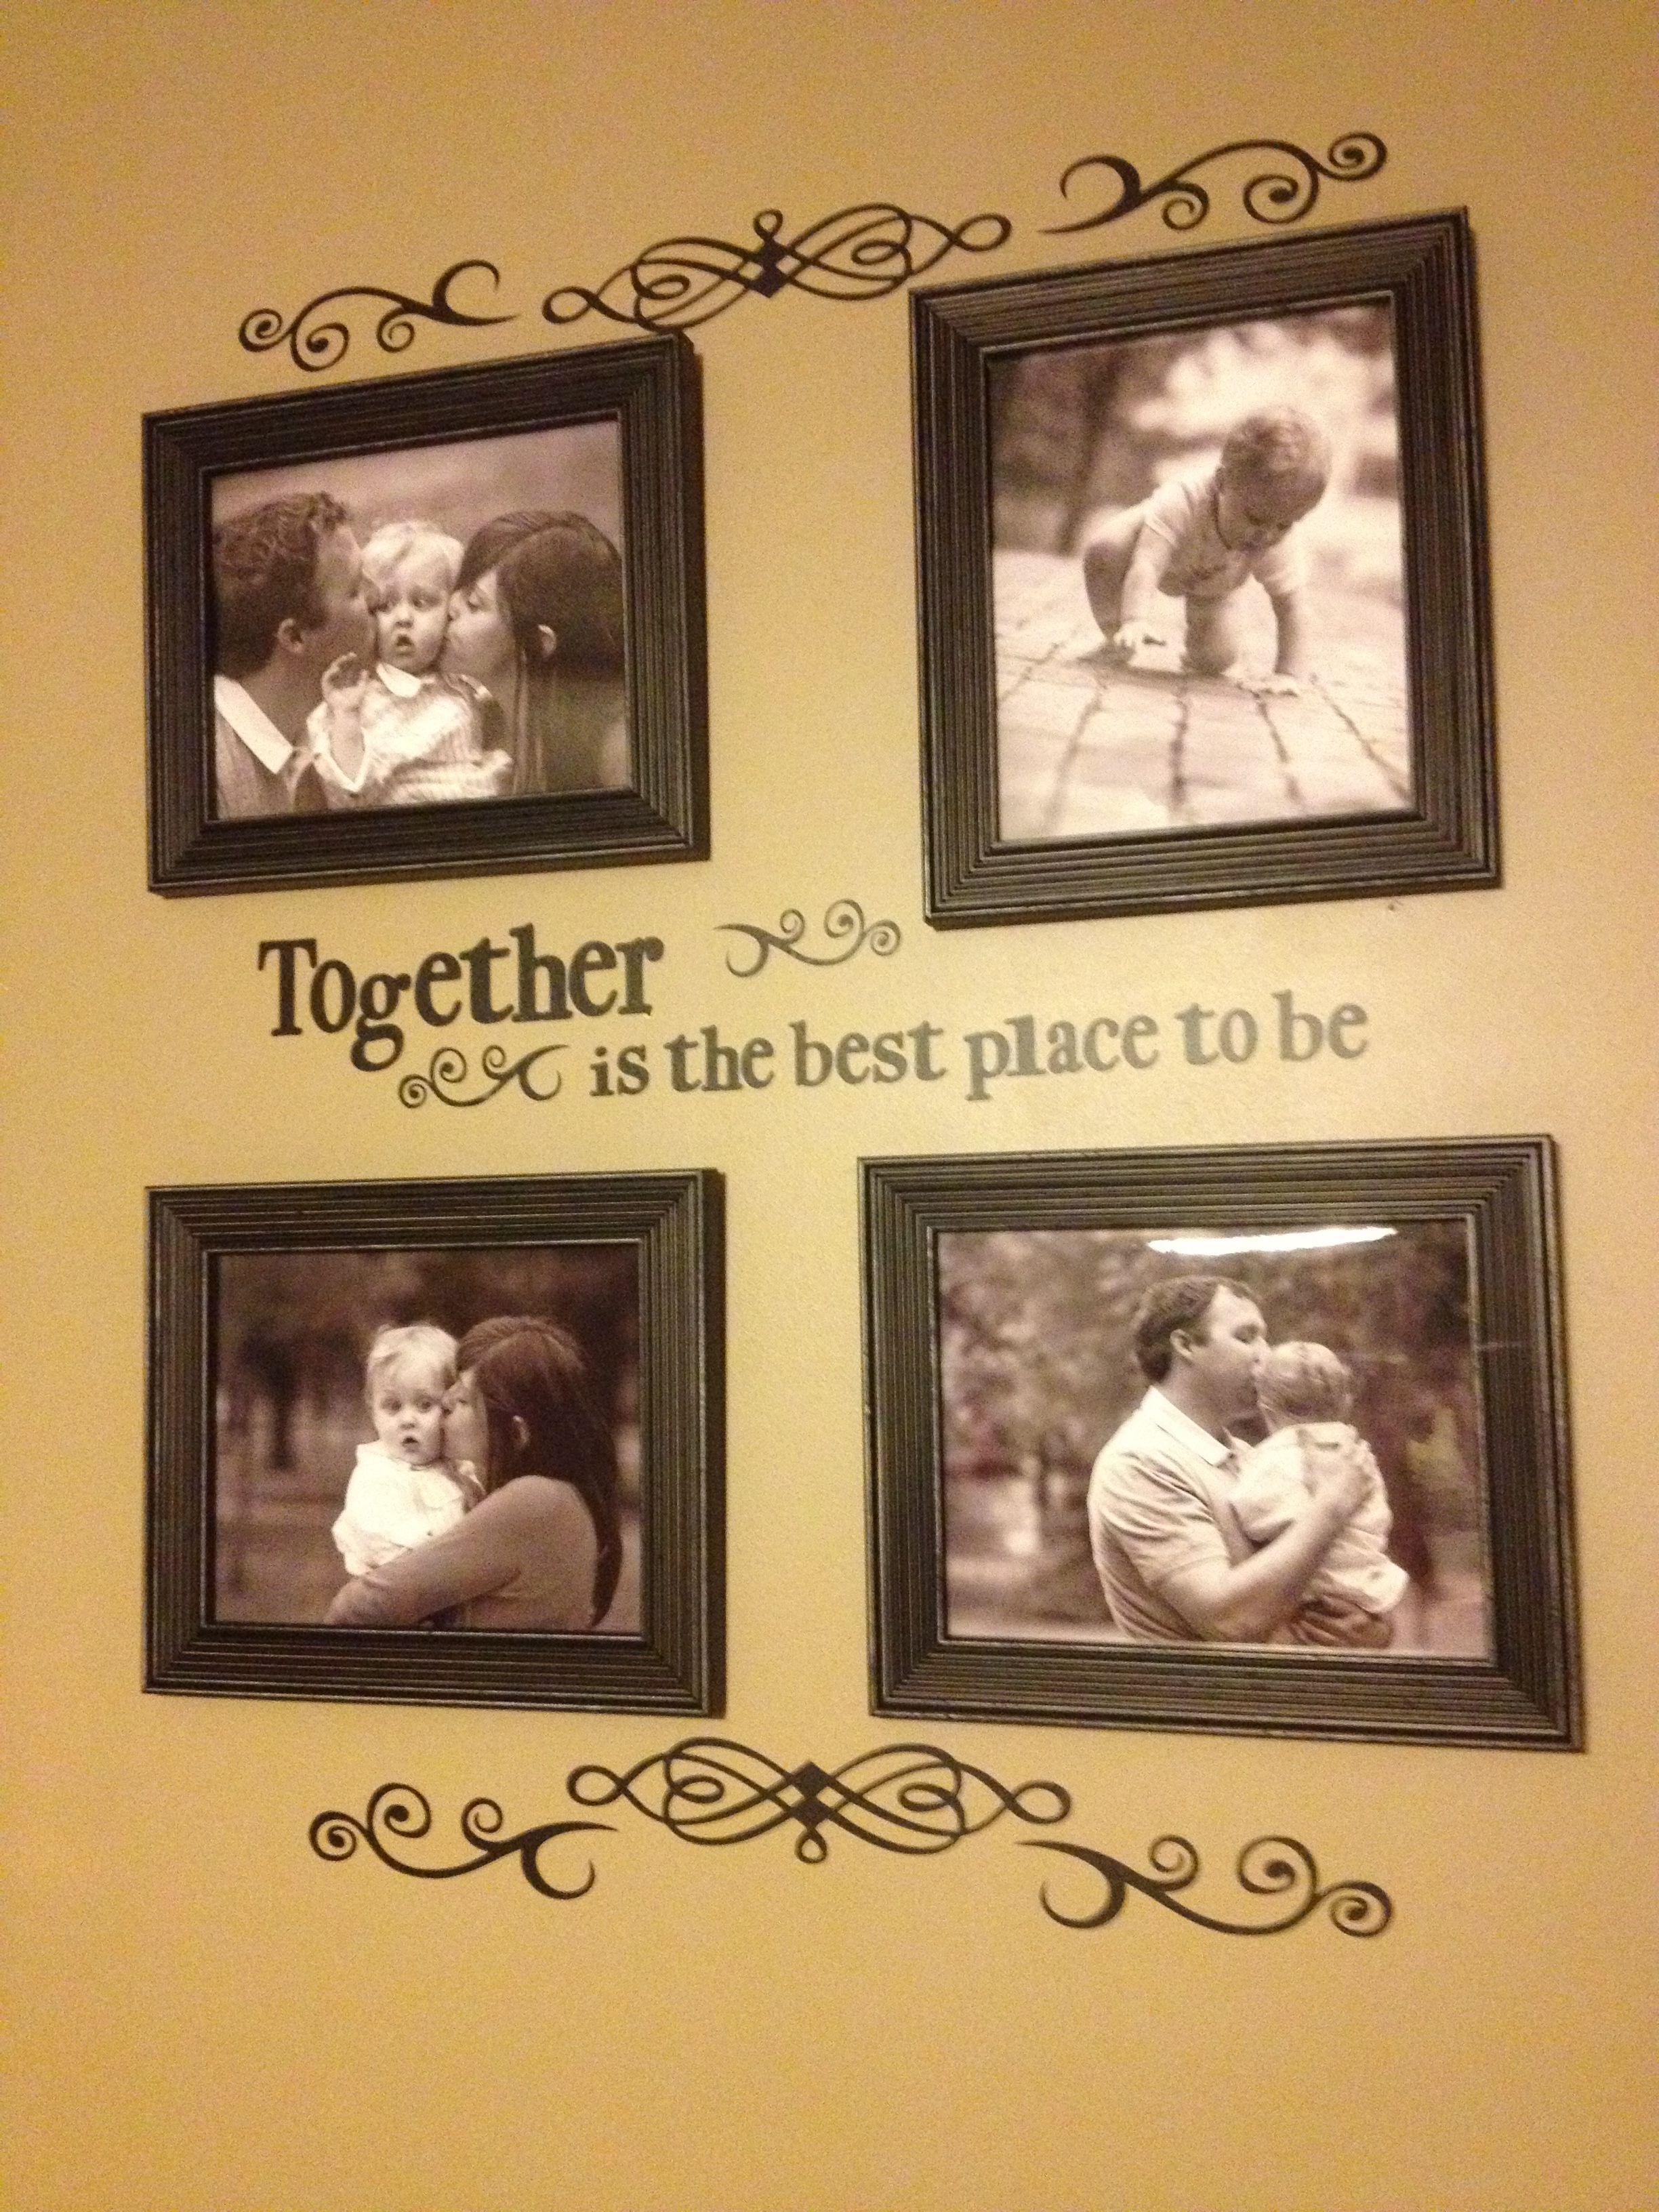 Family vinyl wall art | Idea\'s for the HOME | Pinterest | Vinyl wall ...